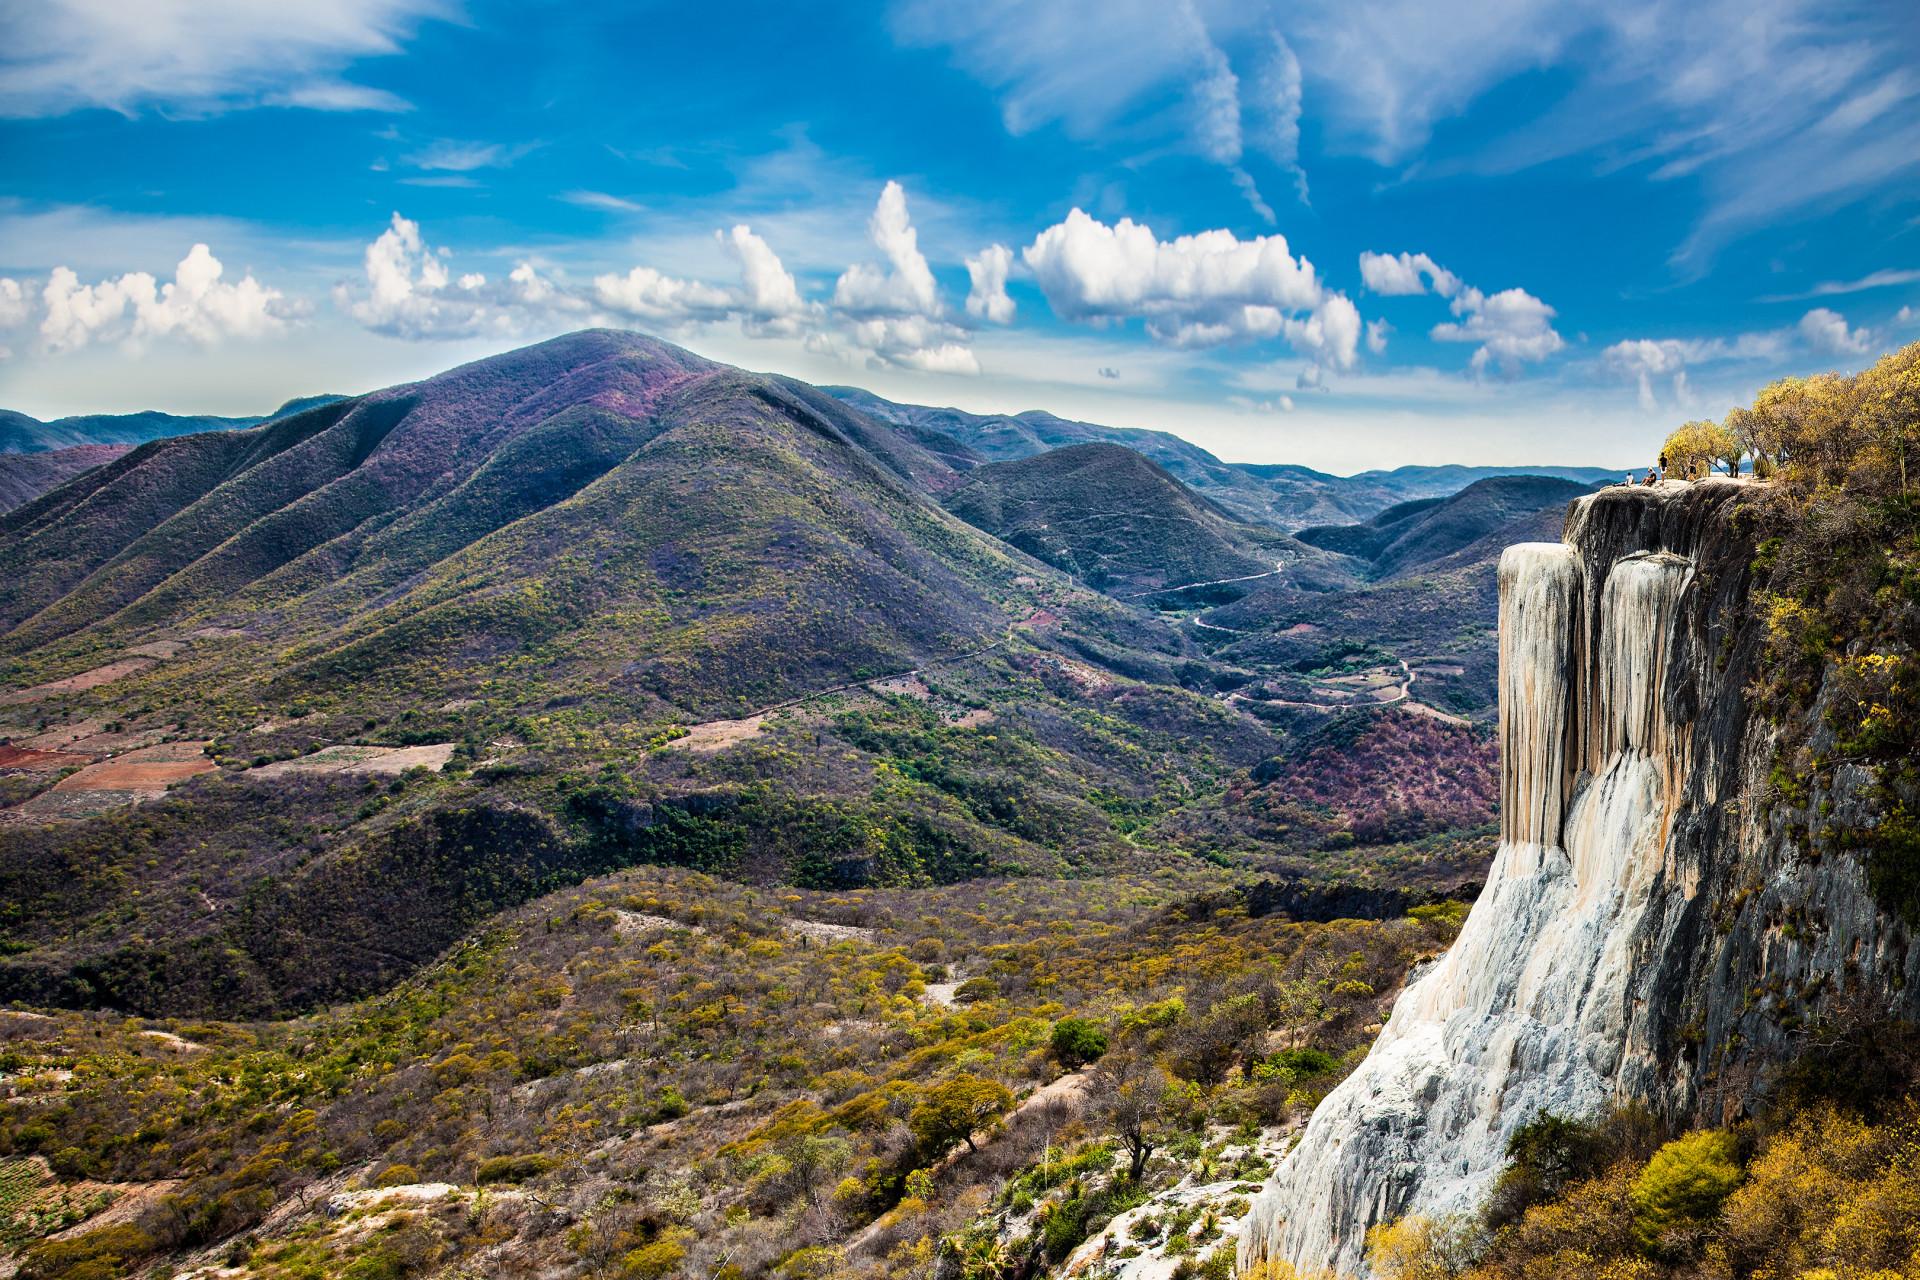 Incredible photos of Mexico's many natural wonders